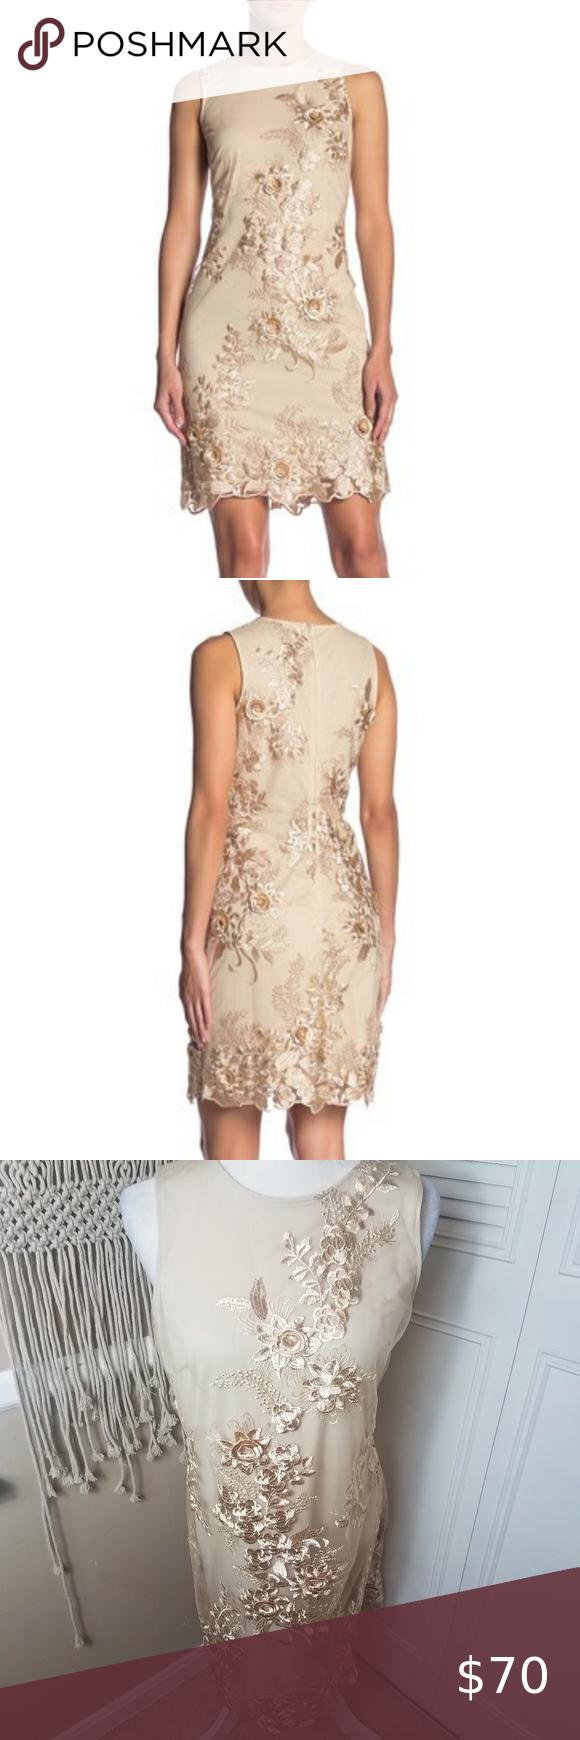 36+ Bcbg florence long tiered dress inspirations